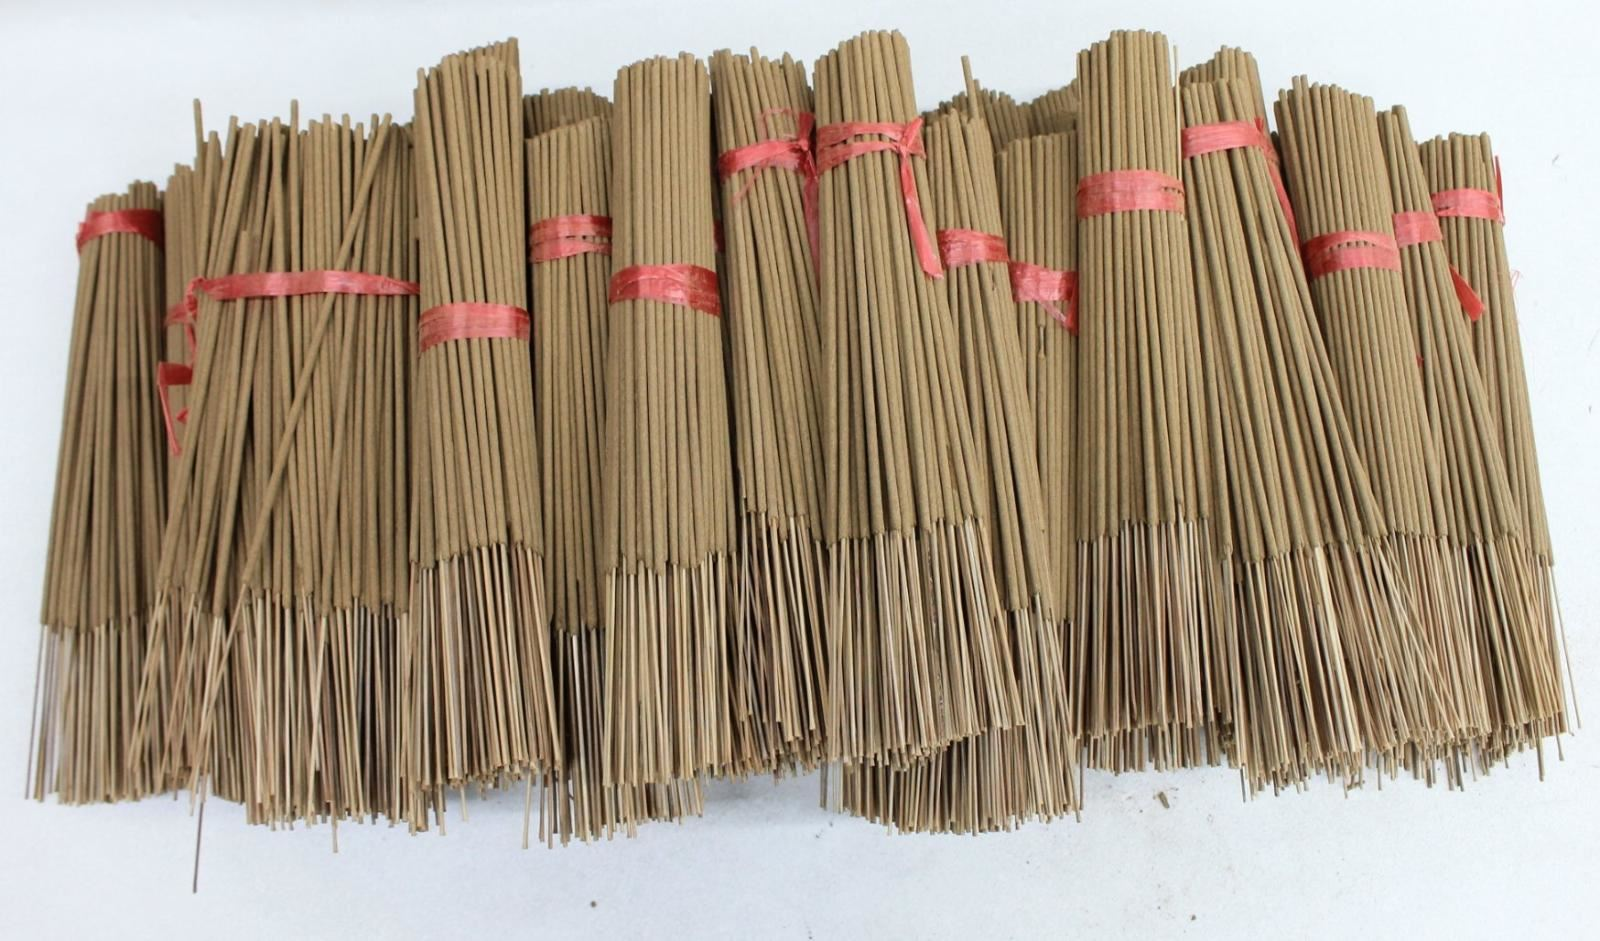 1000x-Unscented-Fragrance-Free-11-034-Make-Your-Own-DIY-Incense-Sticks-Bundle-NEW